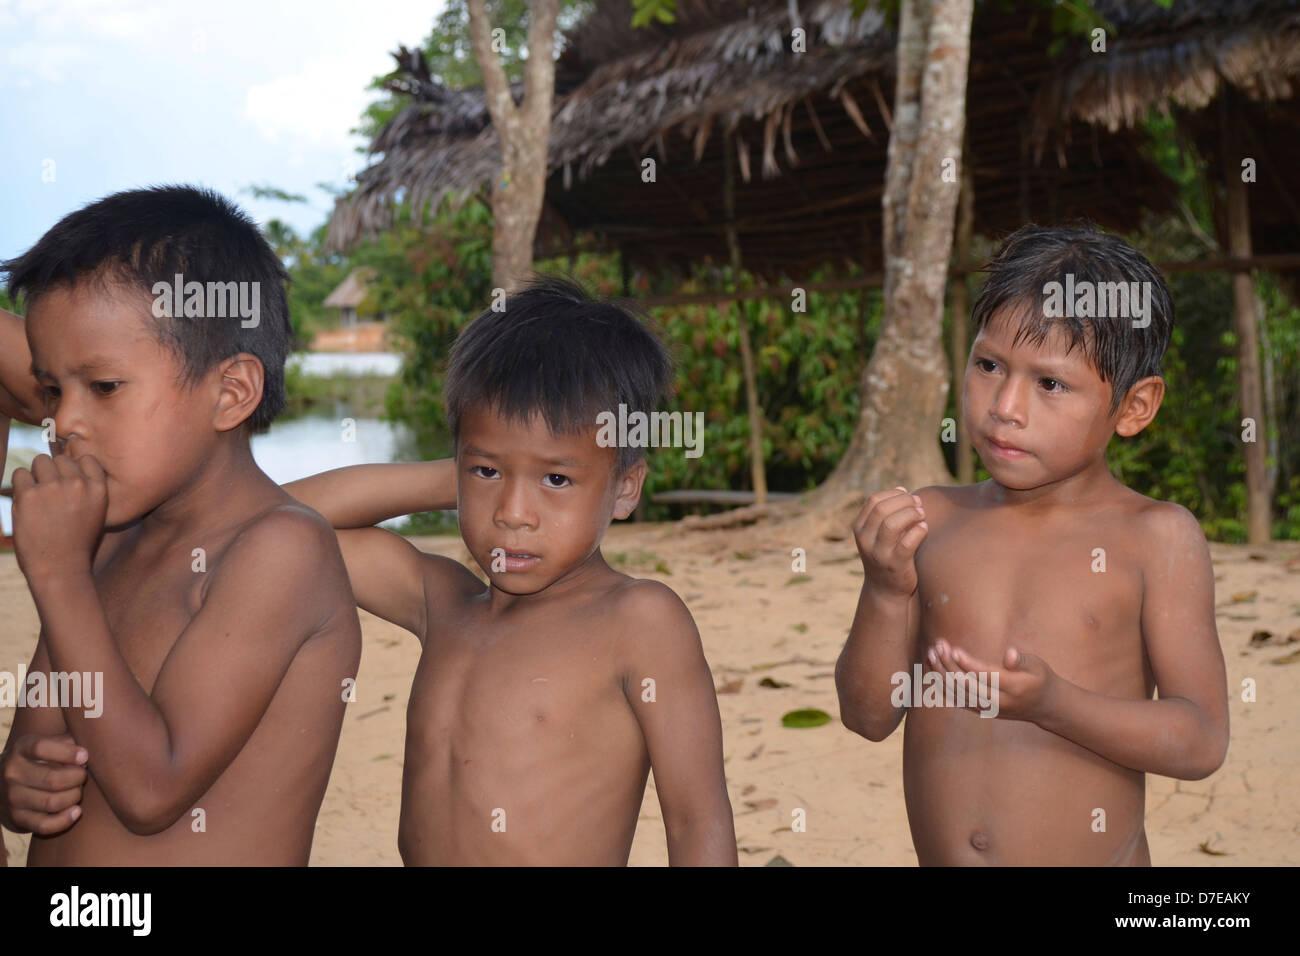 brazillian native indians nude